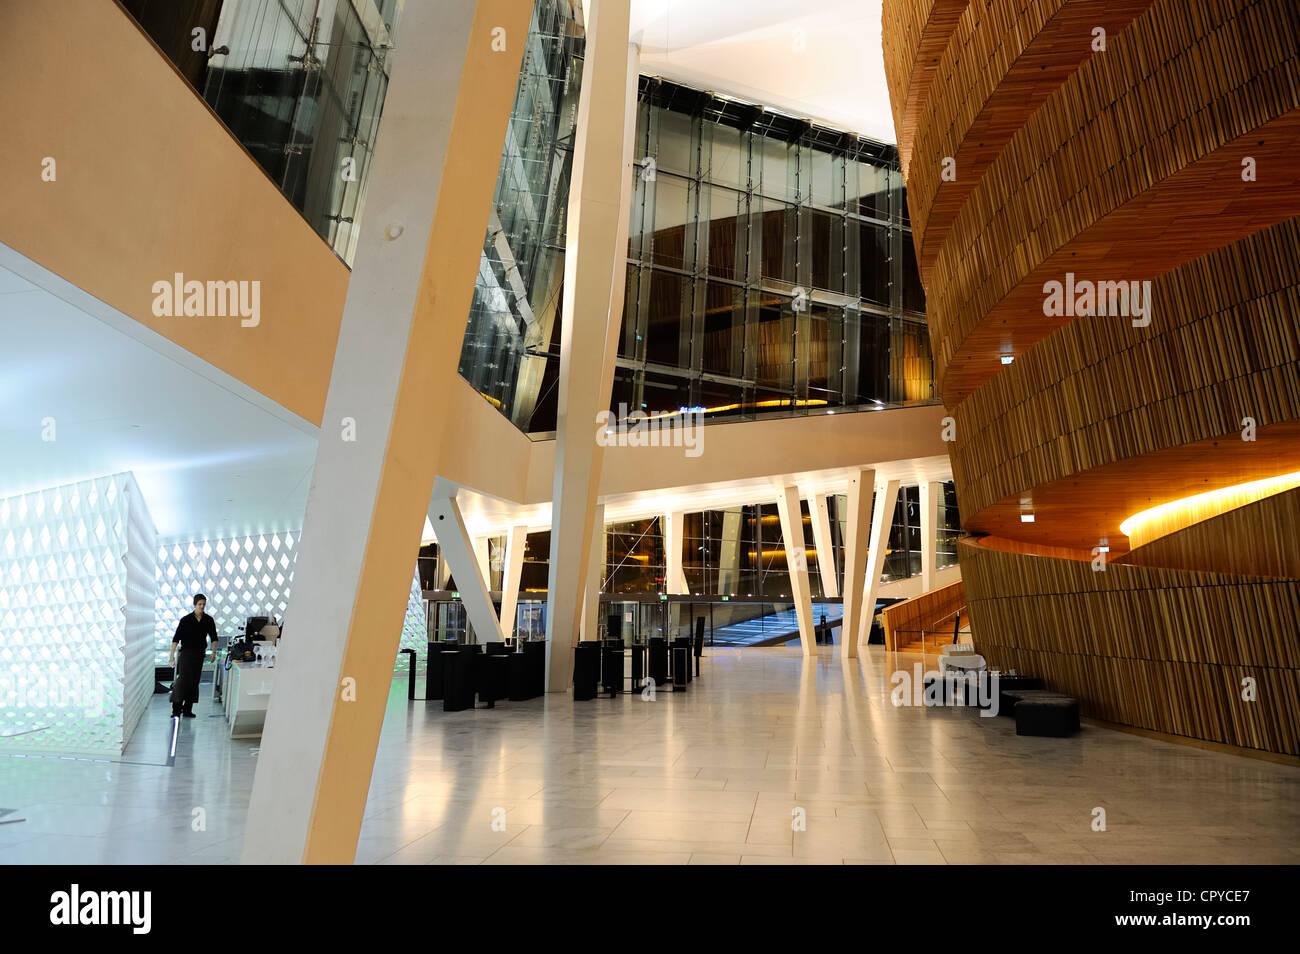 Norway, Oslo, docks district of Bjorvika, the new opera house by Snohetta architects - Stock Image